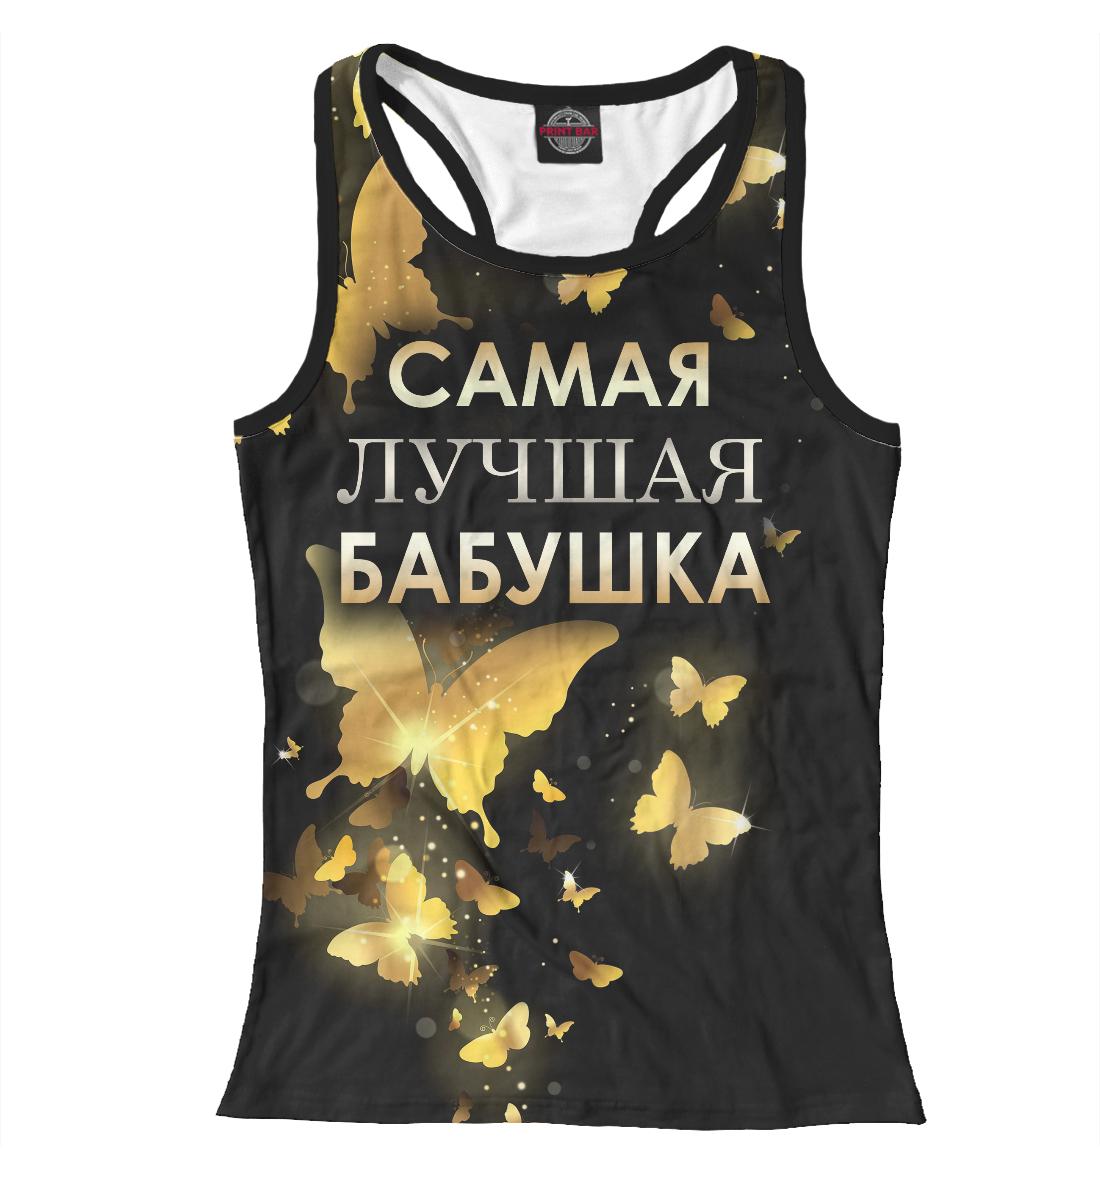 Купить Самая лучшая бабушка, Printbar, Майки борцовки, MRT-344480-mayb-1